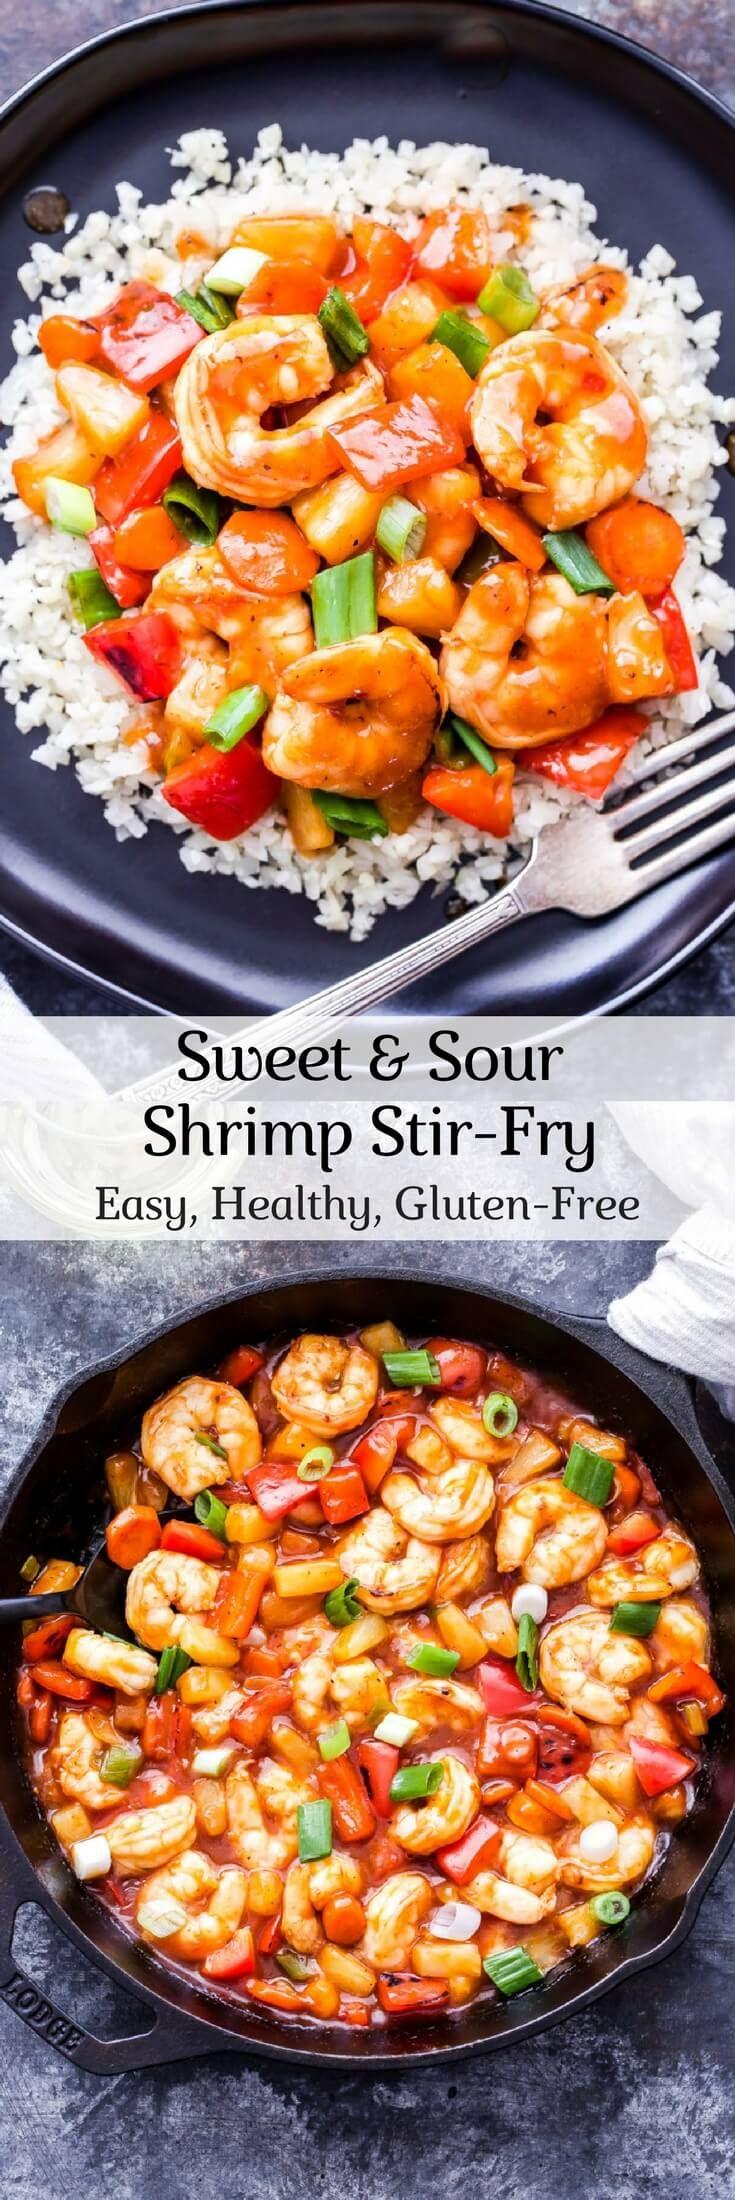 Sweet and Sour Shrimp Stir-Fry - Recipe Runner